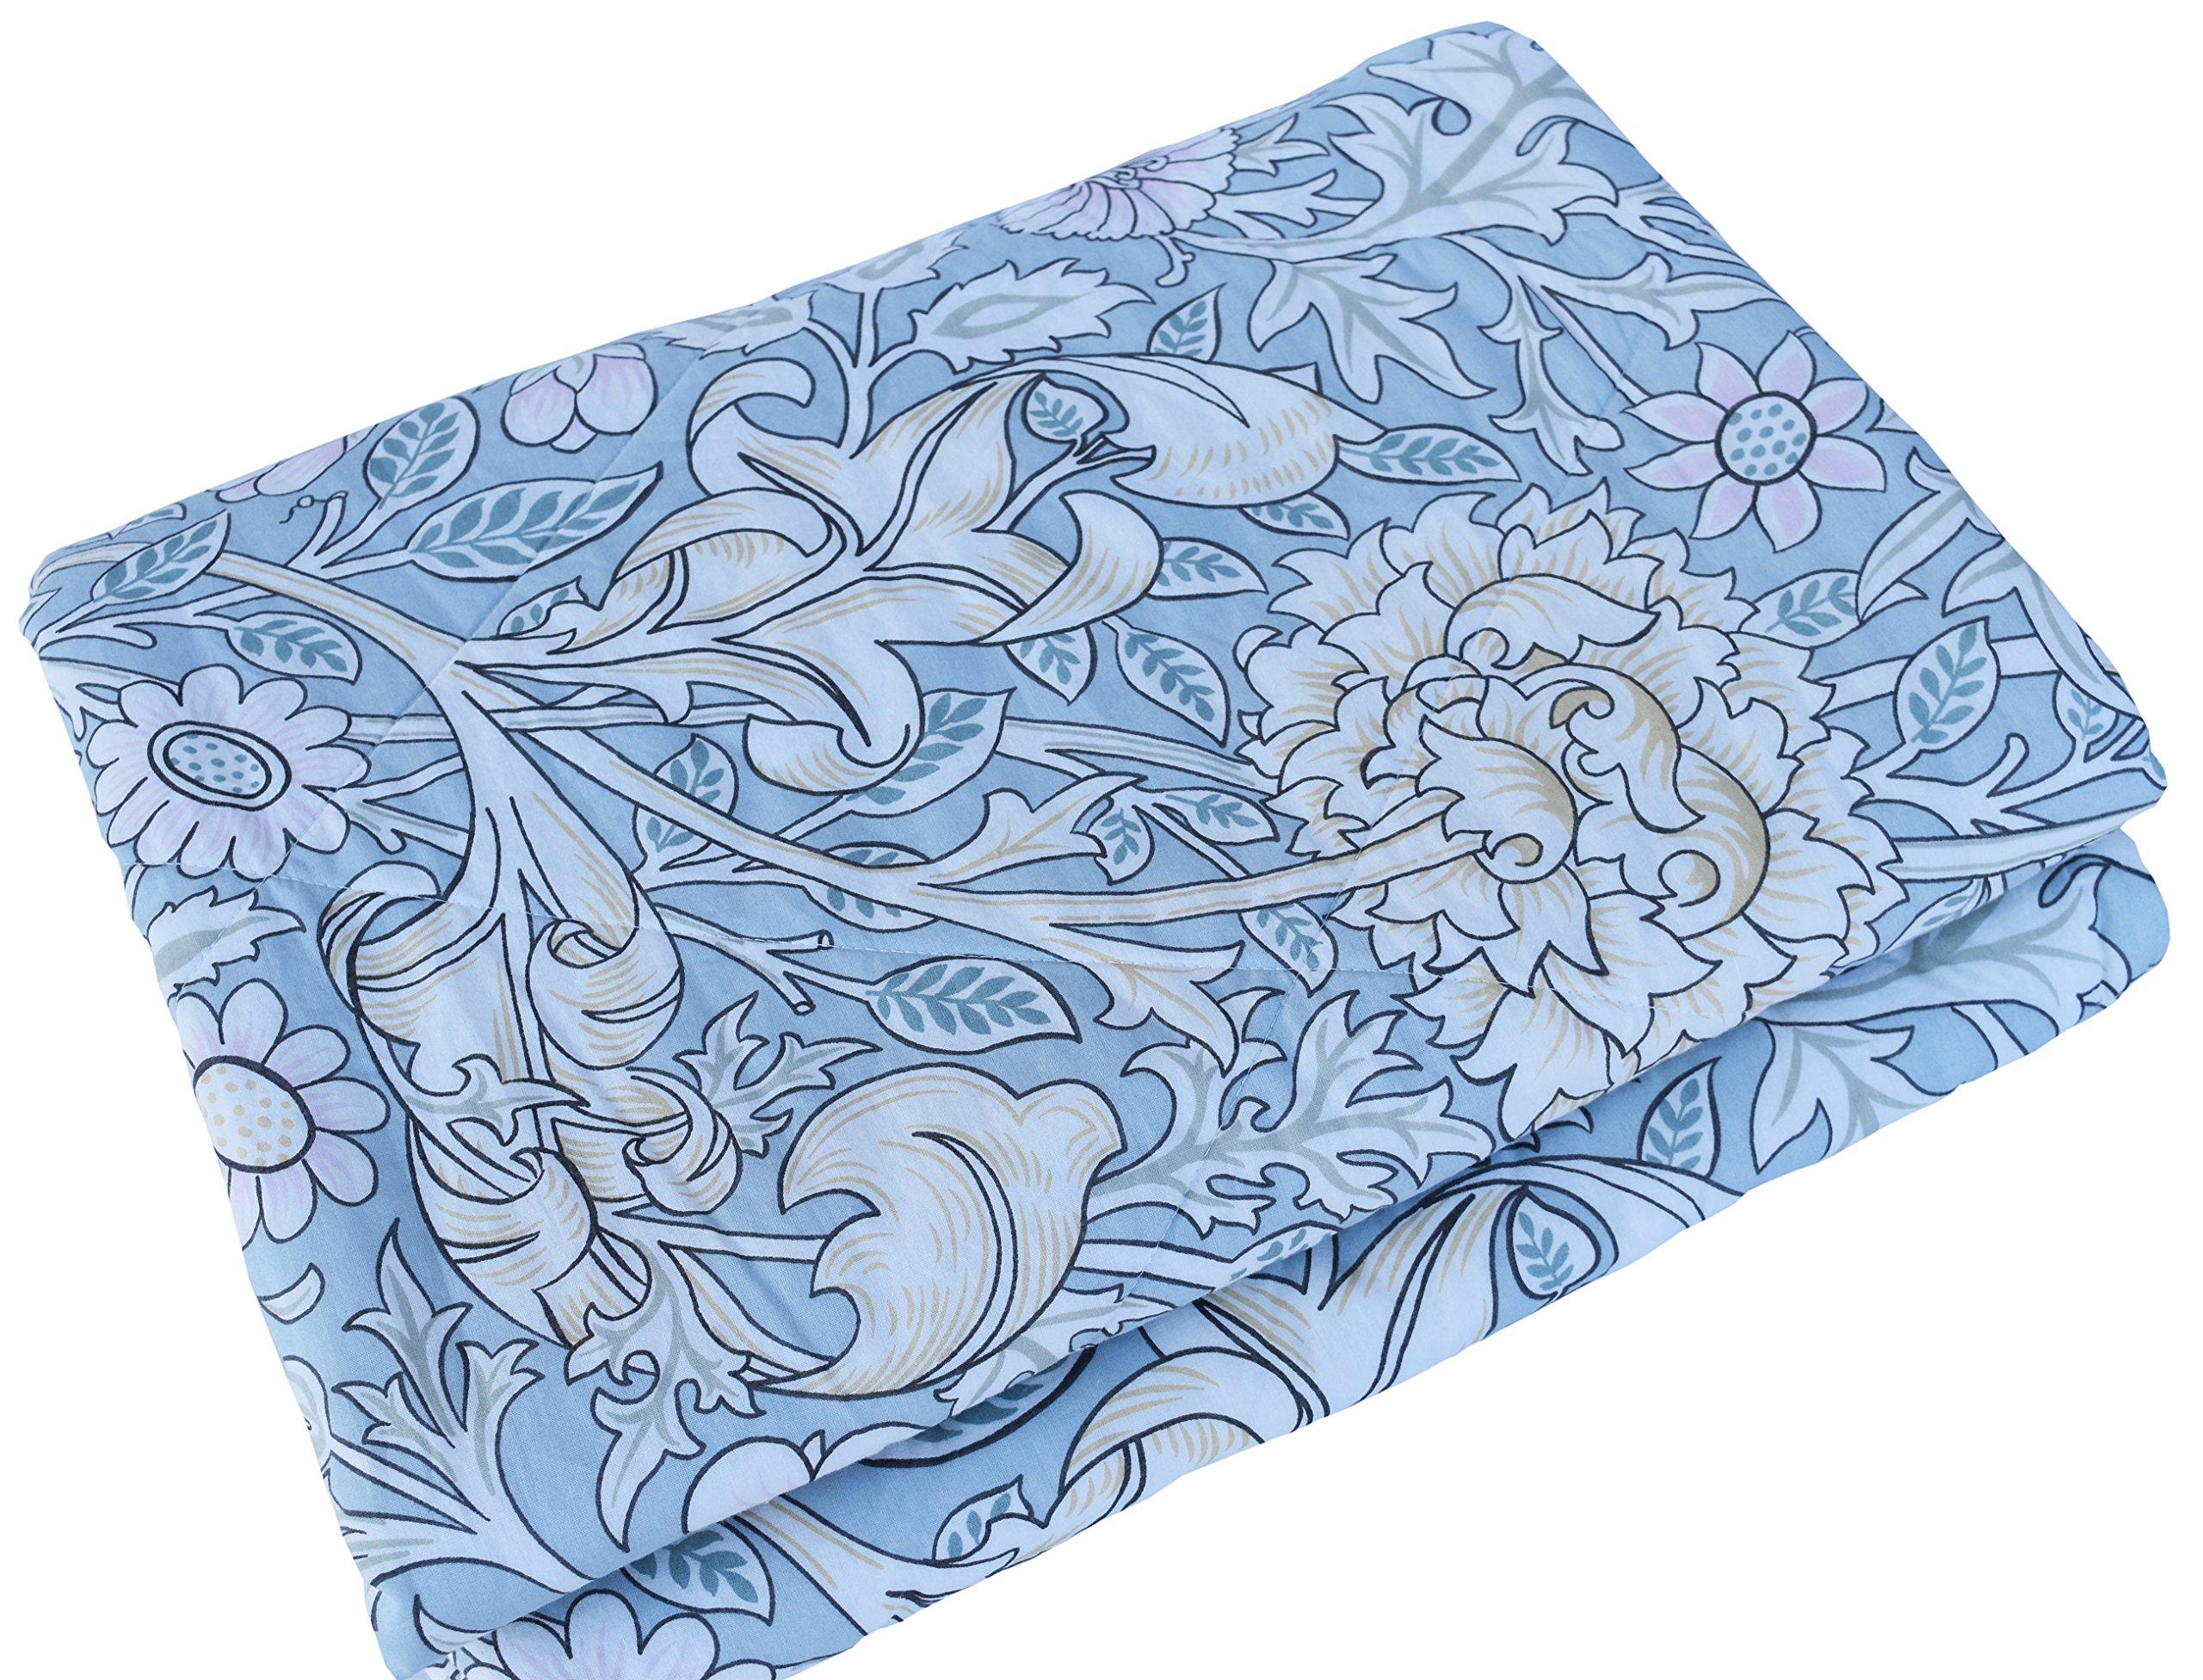 J-pinno Boys & Girls Blooming Flowers Muslin Quilt Comforter Bedding Coverlet Twin, 100% Long Staple Cotton Filling, Lightweight Throw Blanket Kid's Bedroom (Twin 59'' X 78'', flowerg)